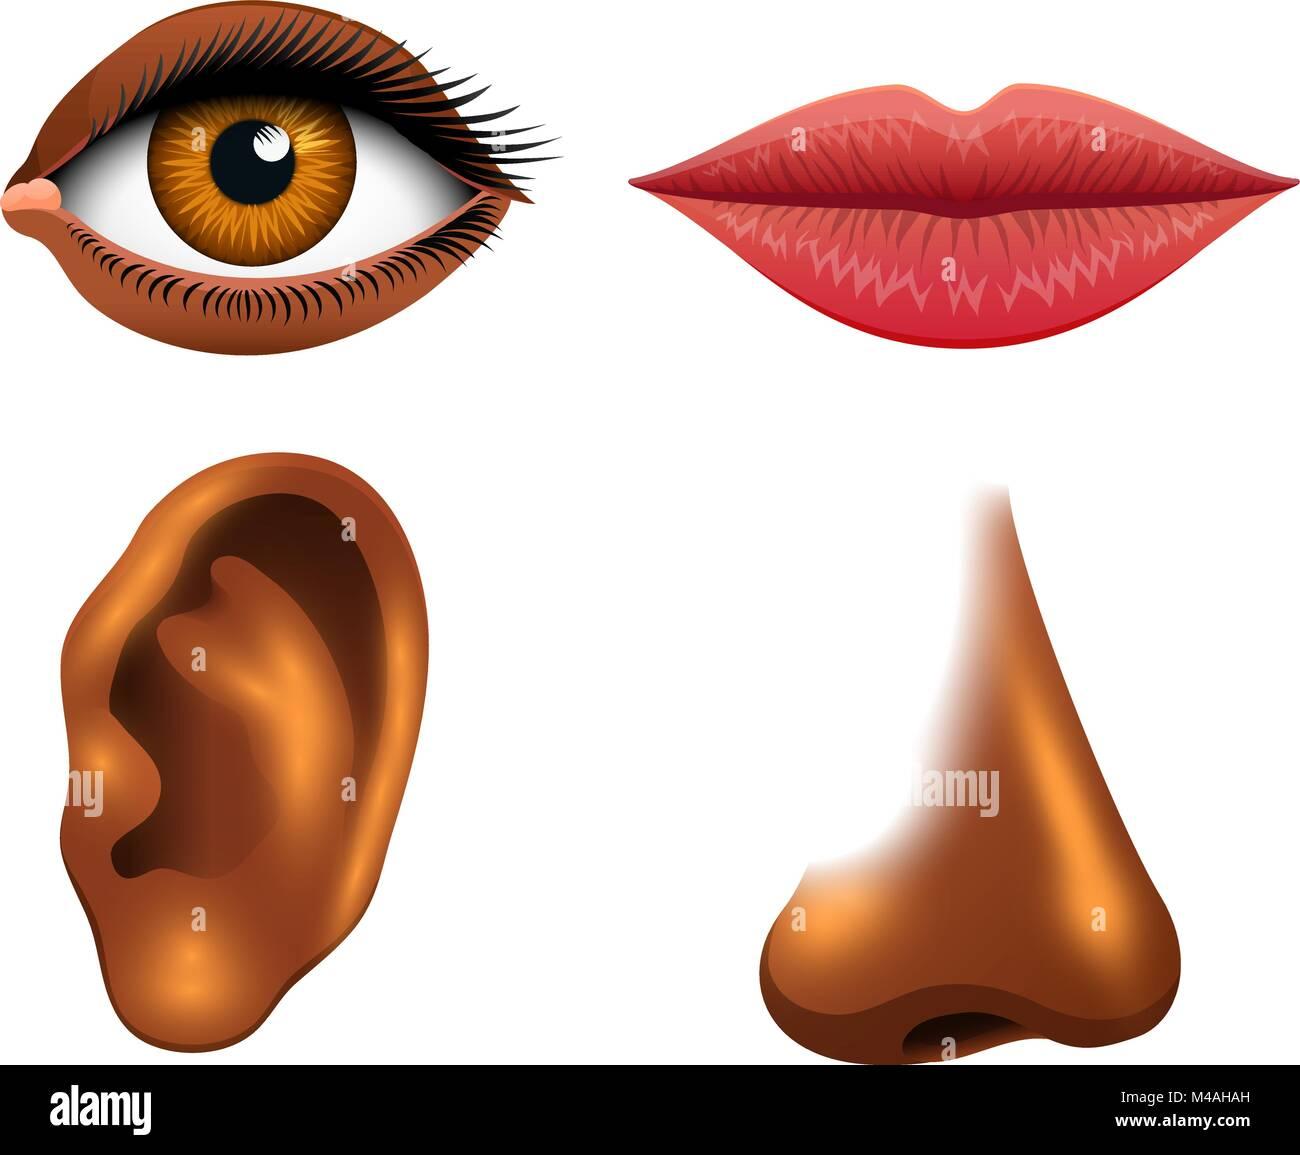 Human biology, sensory organs, anatomy illustration. face detailed ...